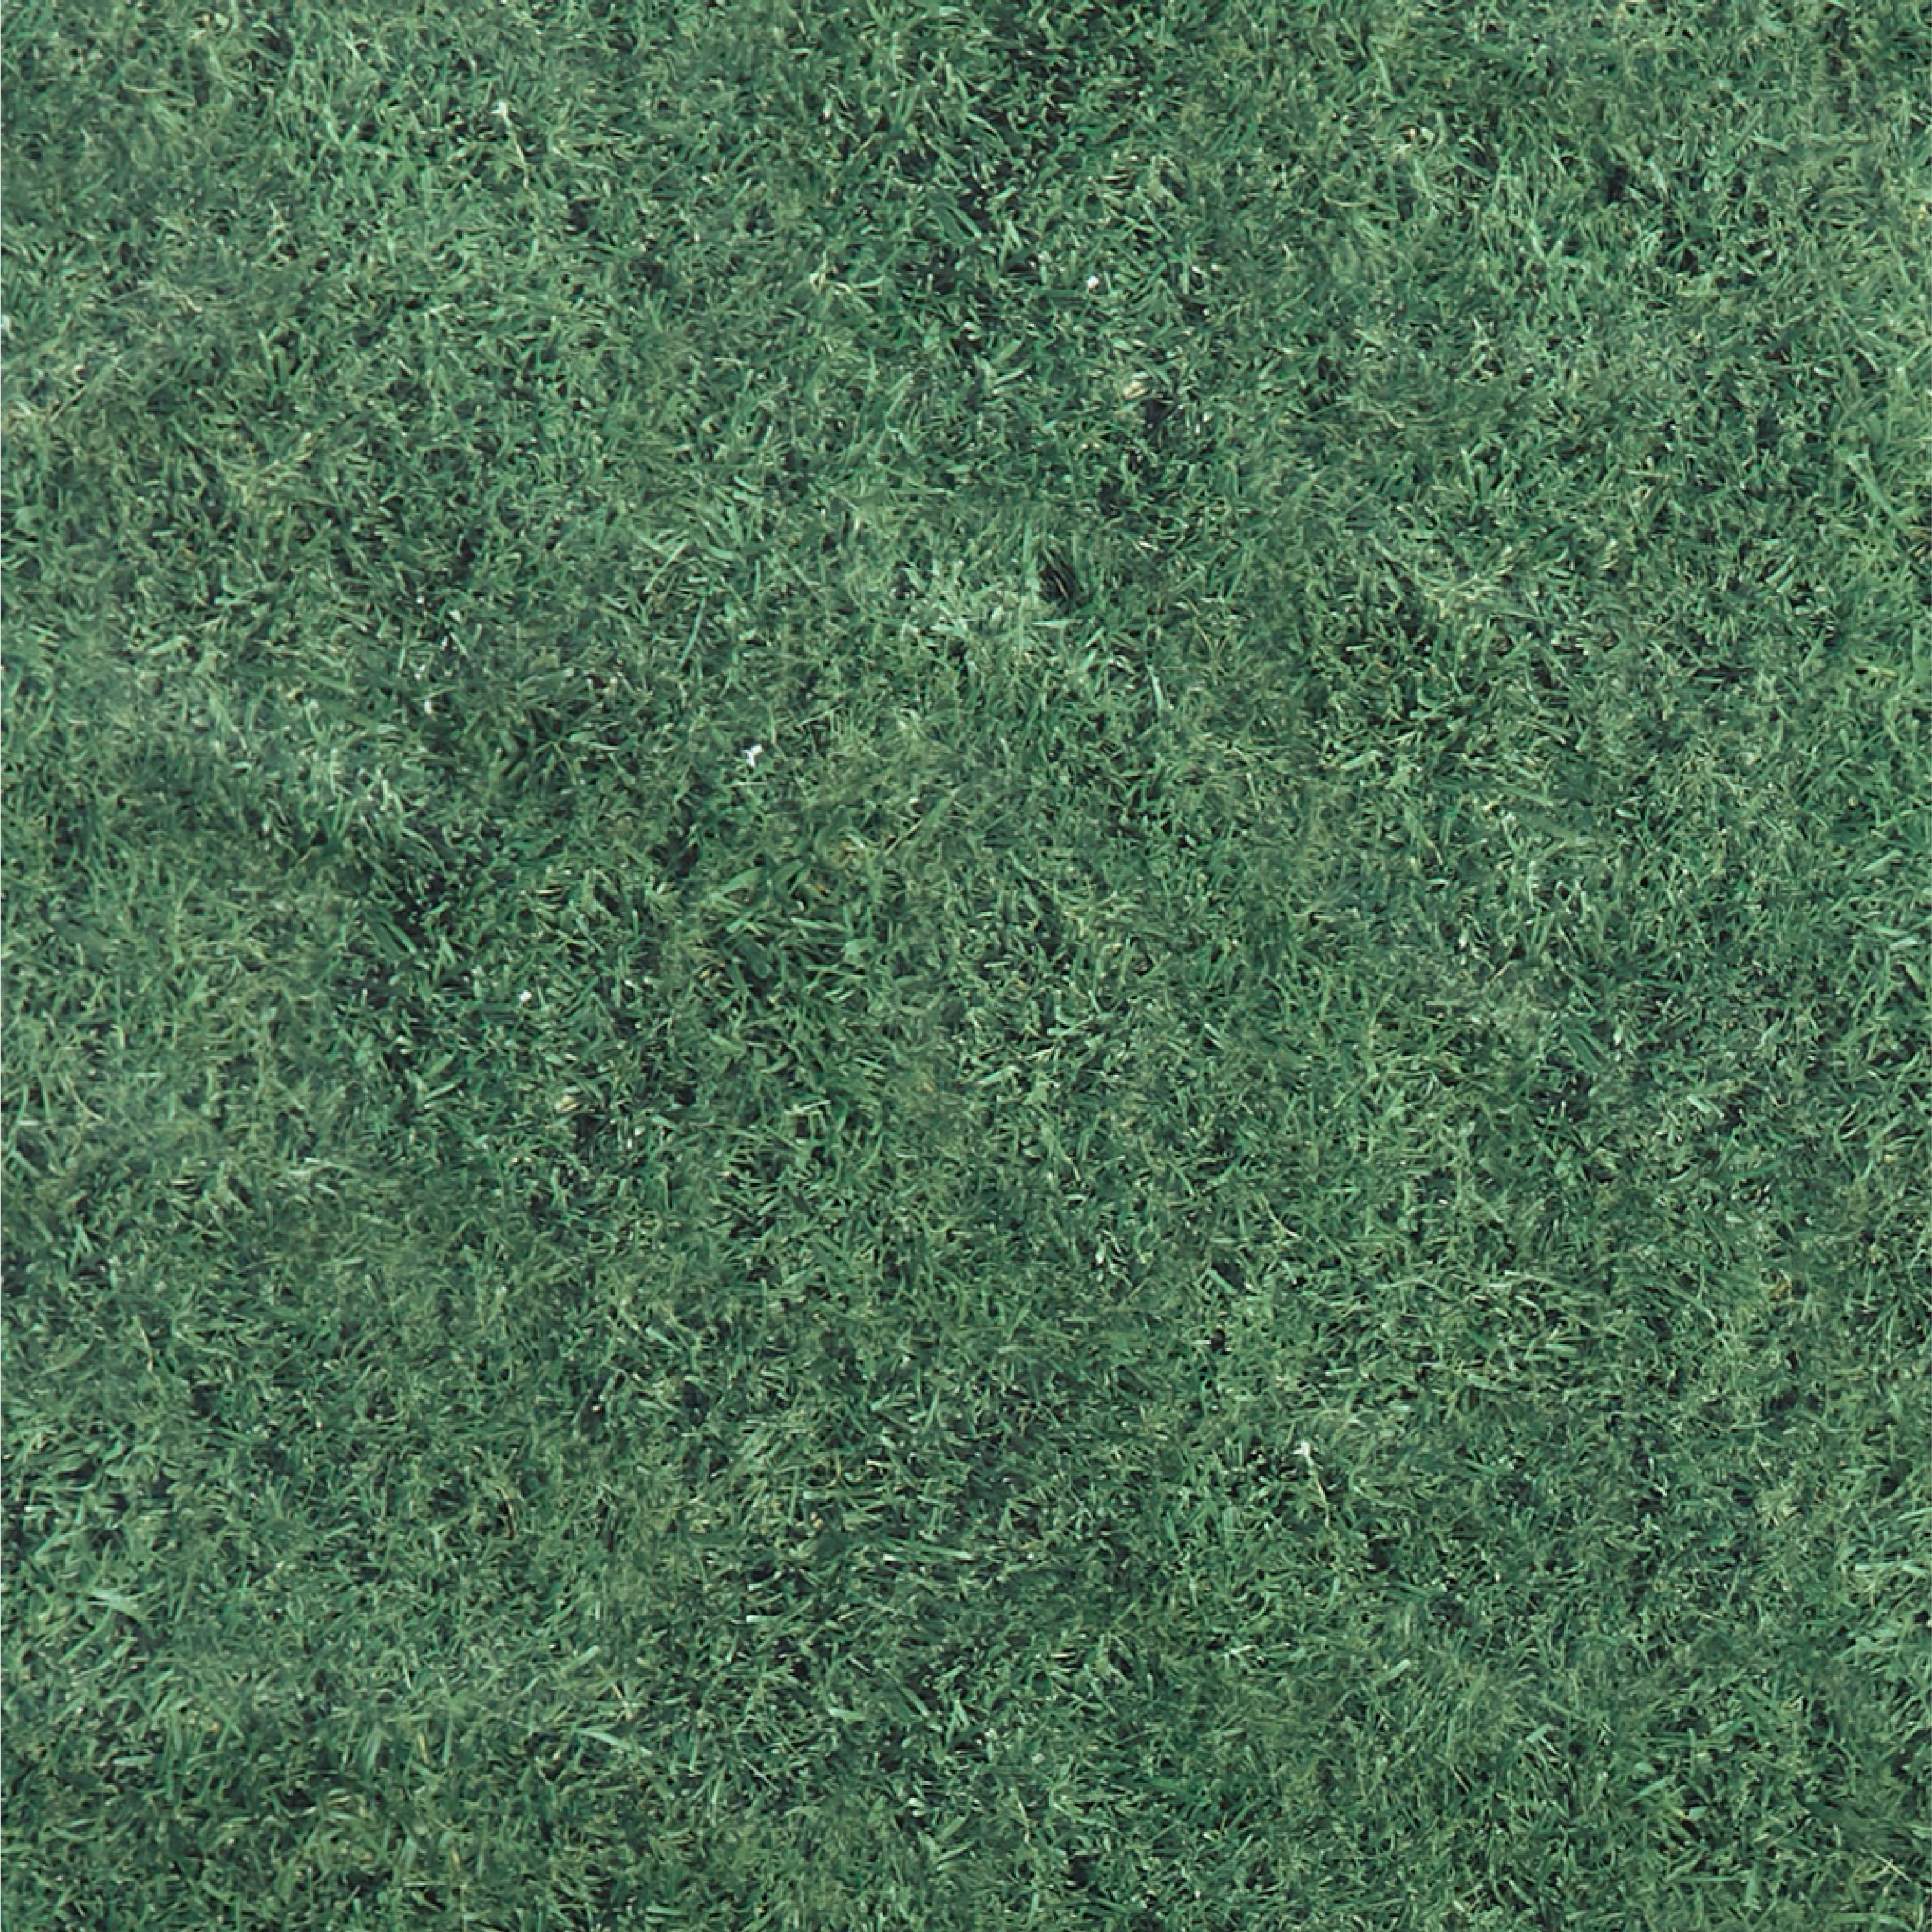 Rumpl Stash Mat Lawn